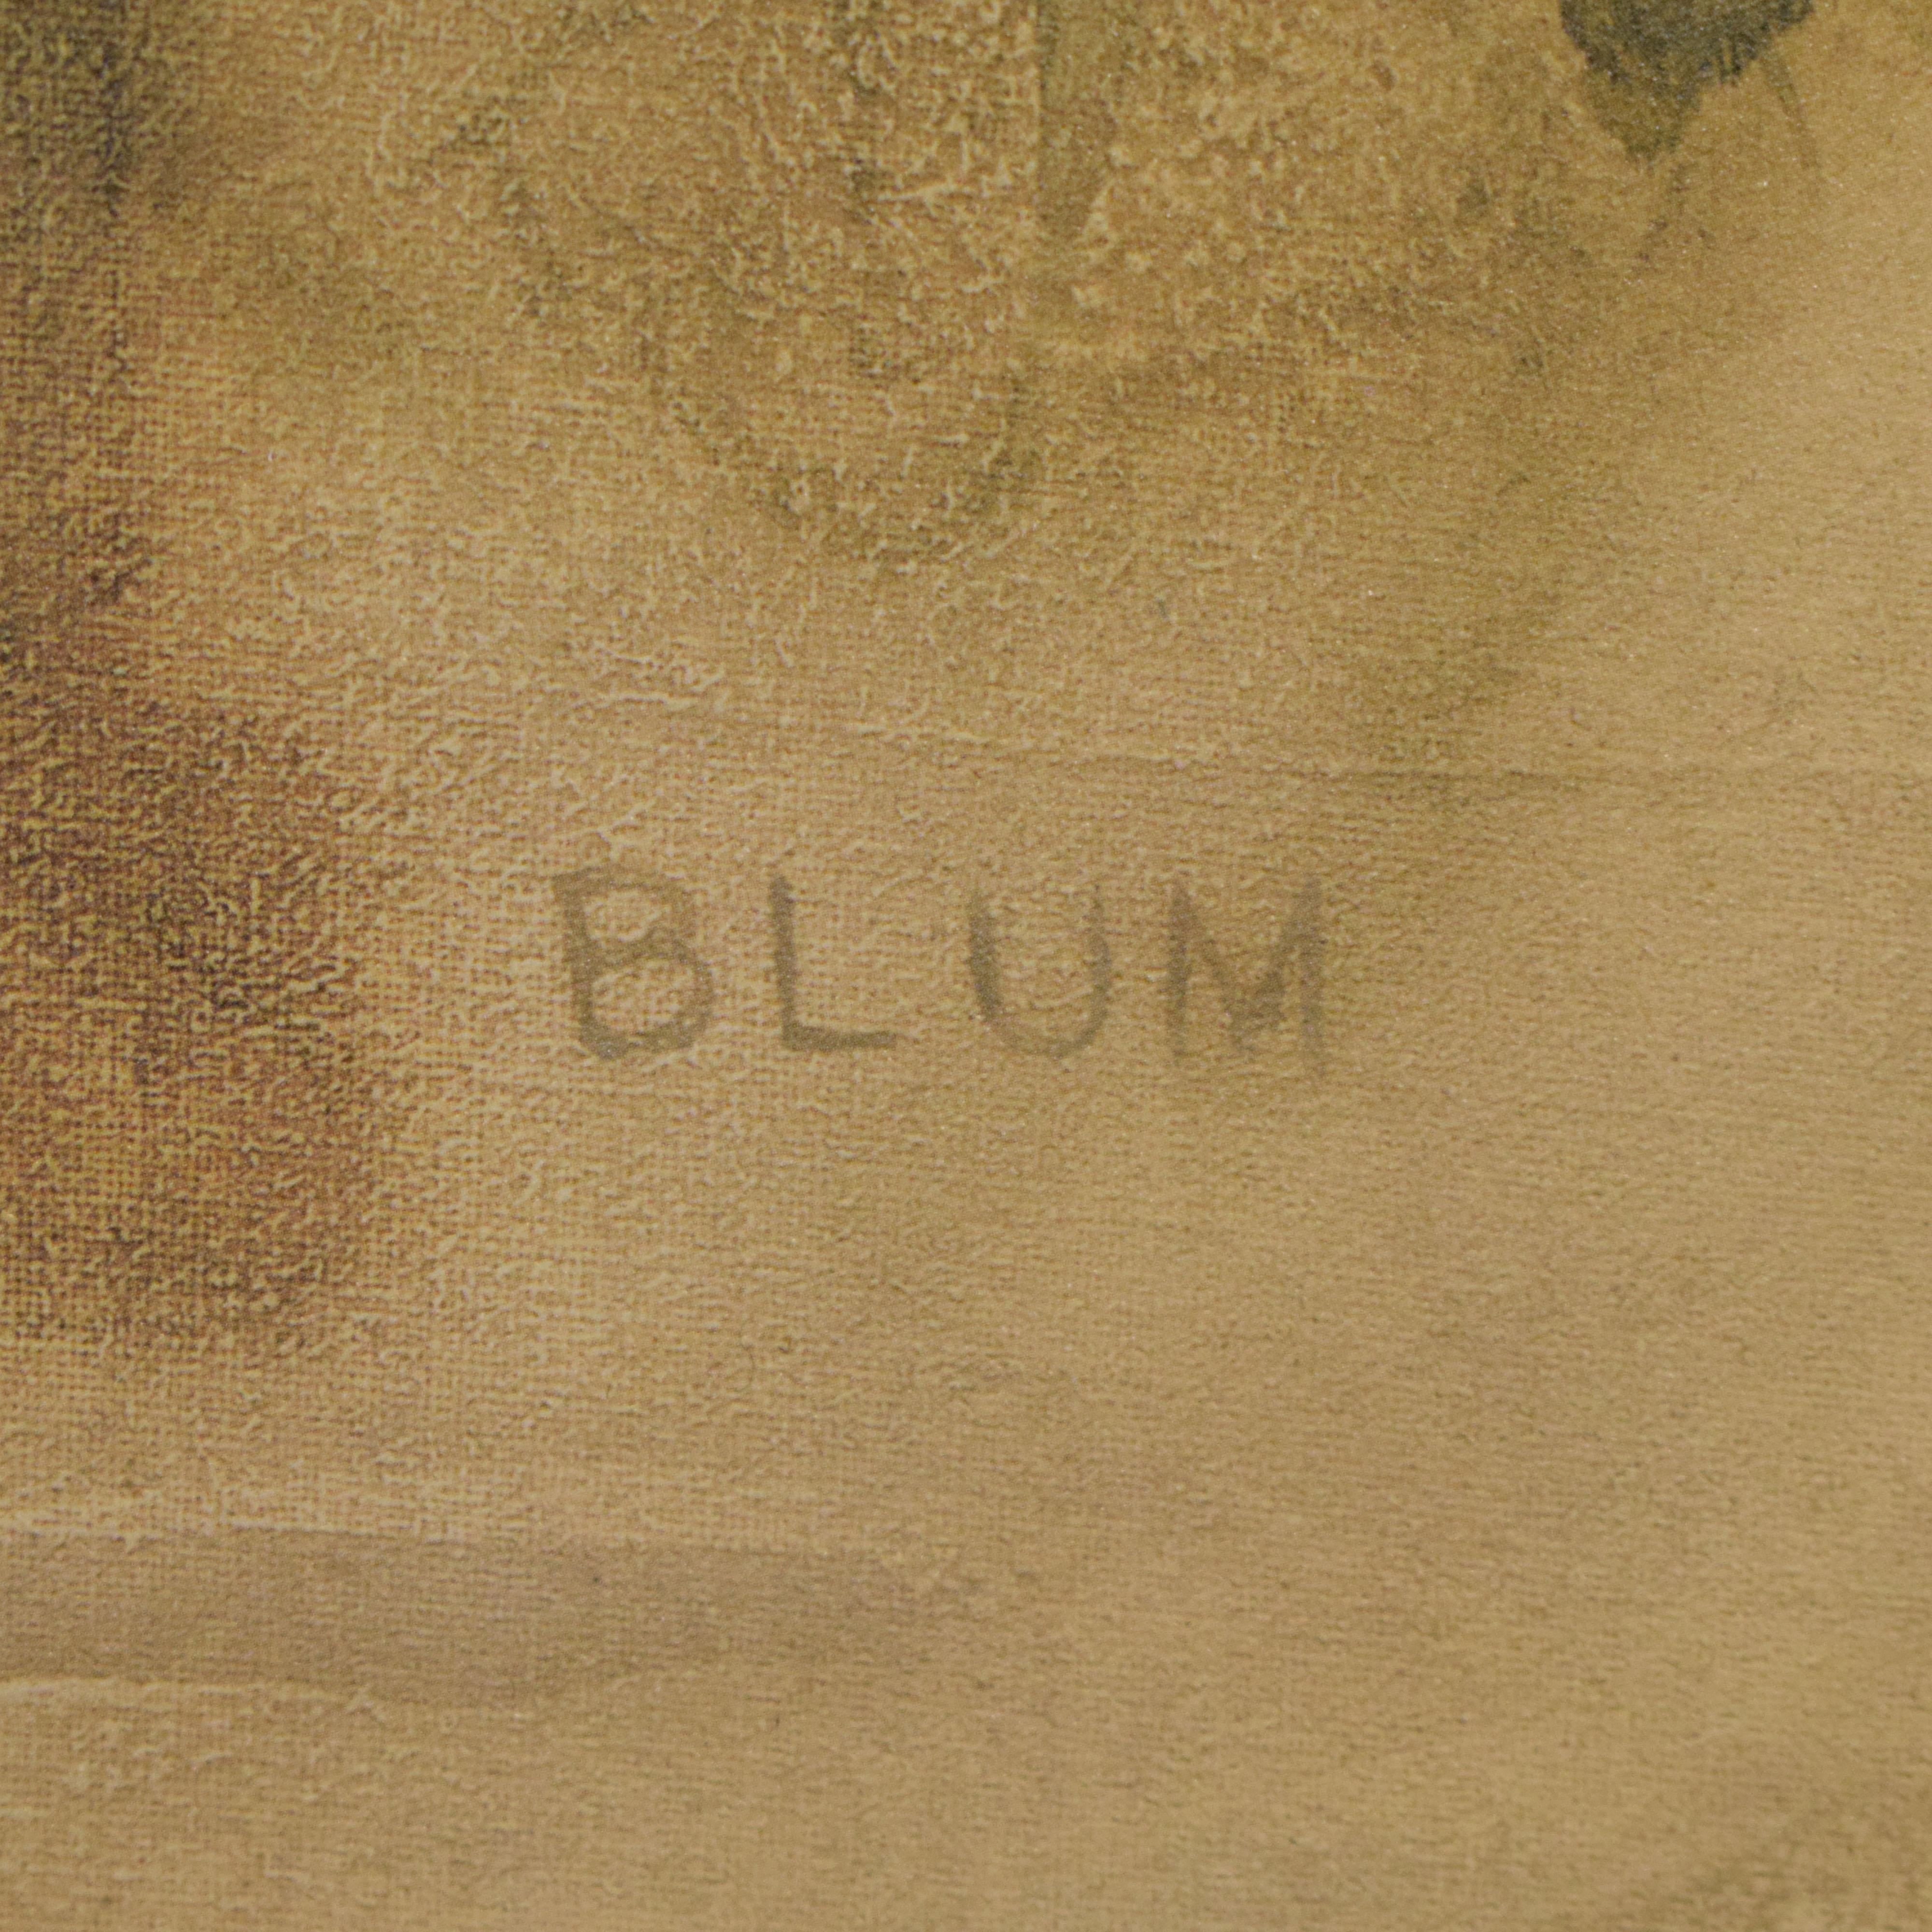 Cheri Blum Wall Art used